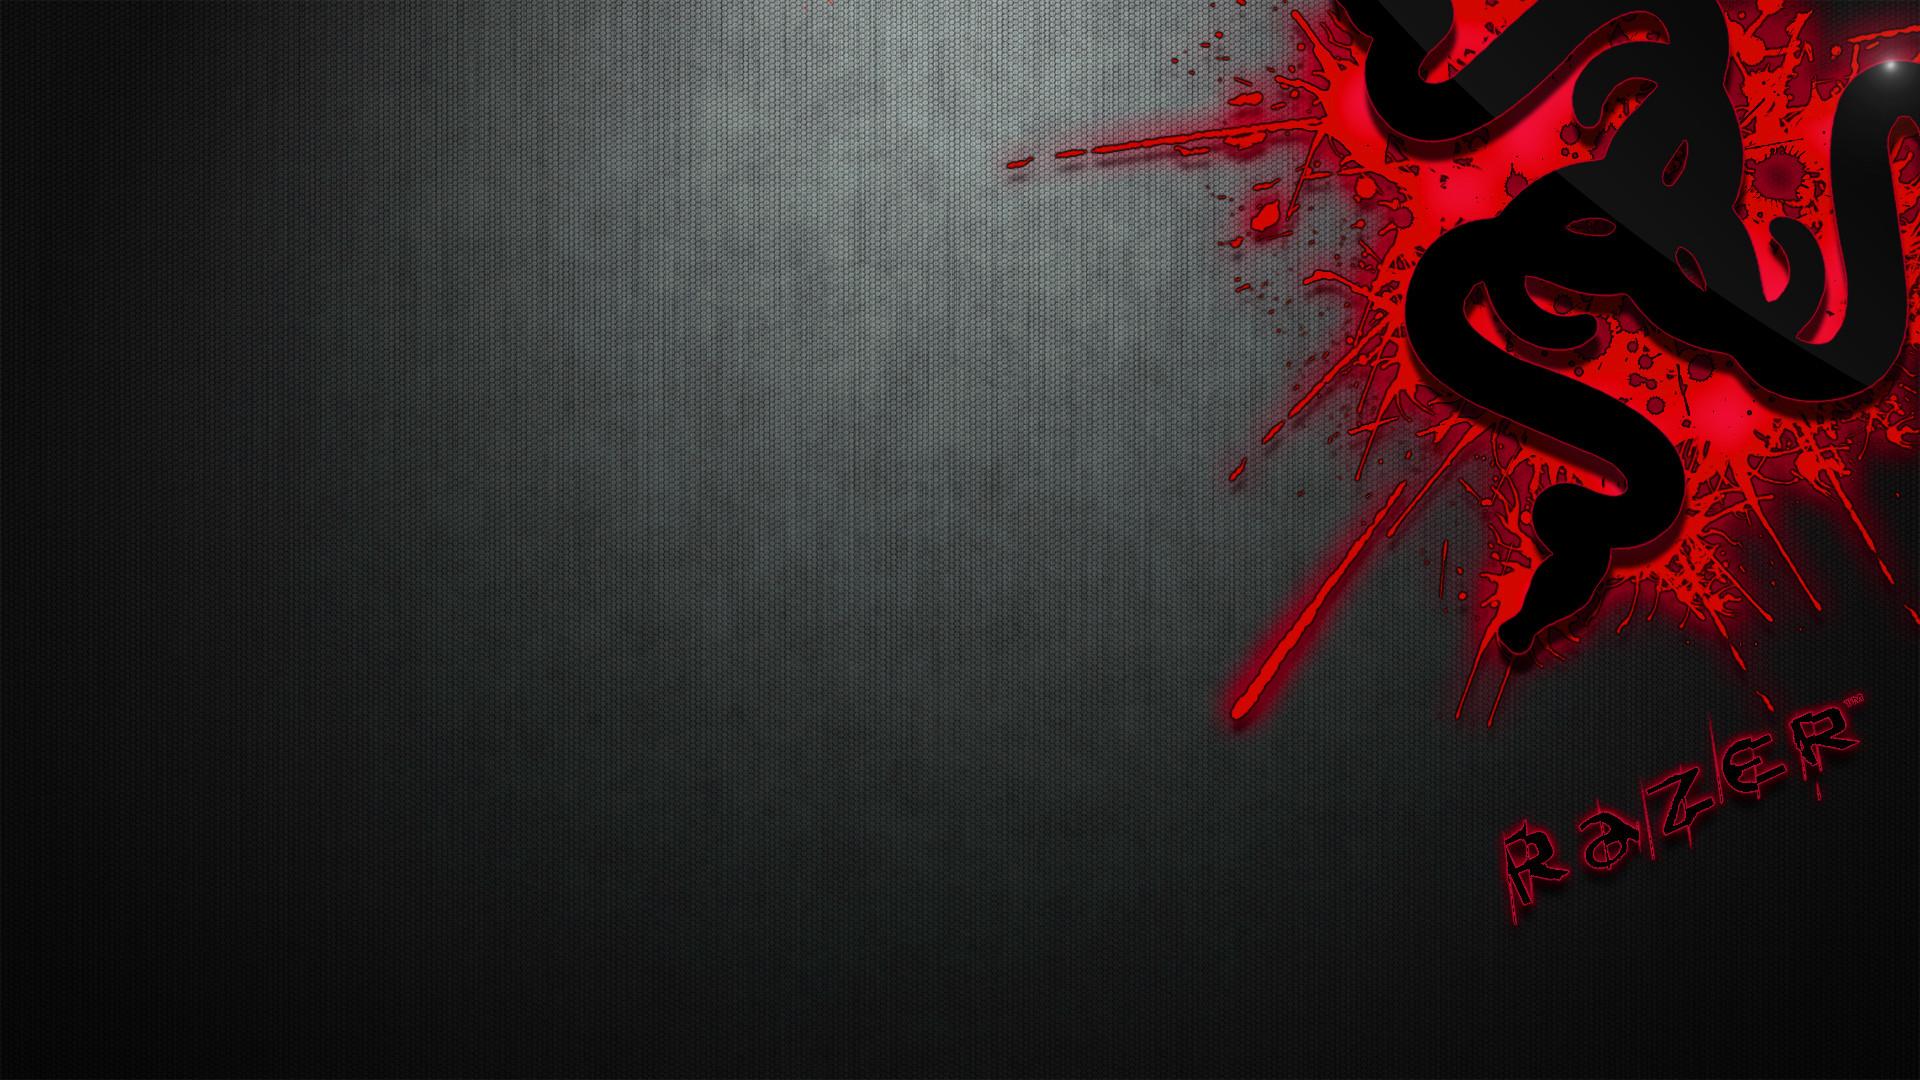 44 Razer HD Wallpapers | Backgrounds – Wallpaper Abyss